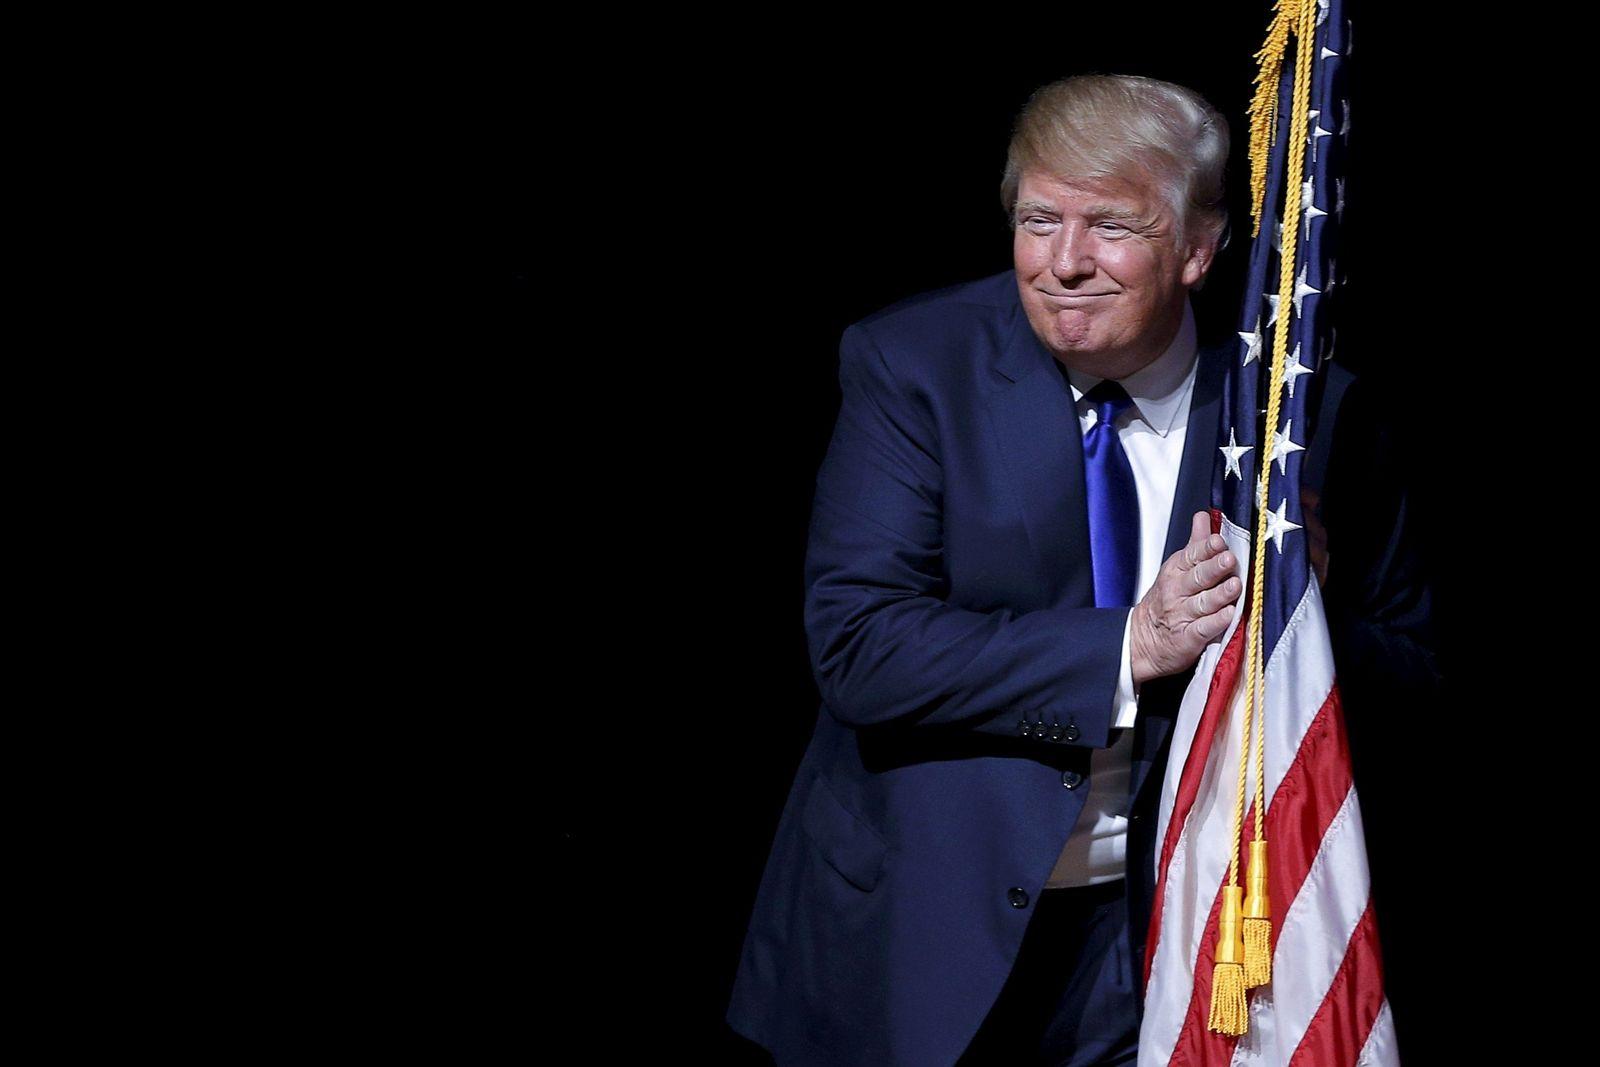 Diez Essay USA-ELECTION/TRUMP-PROFILE